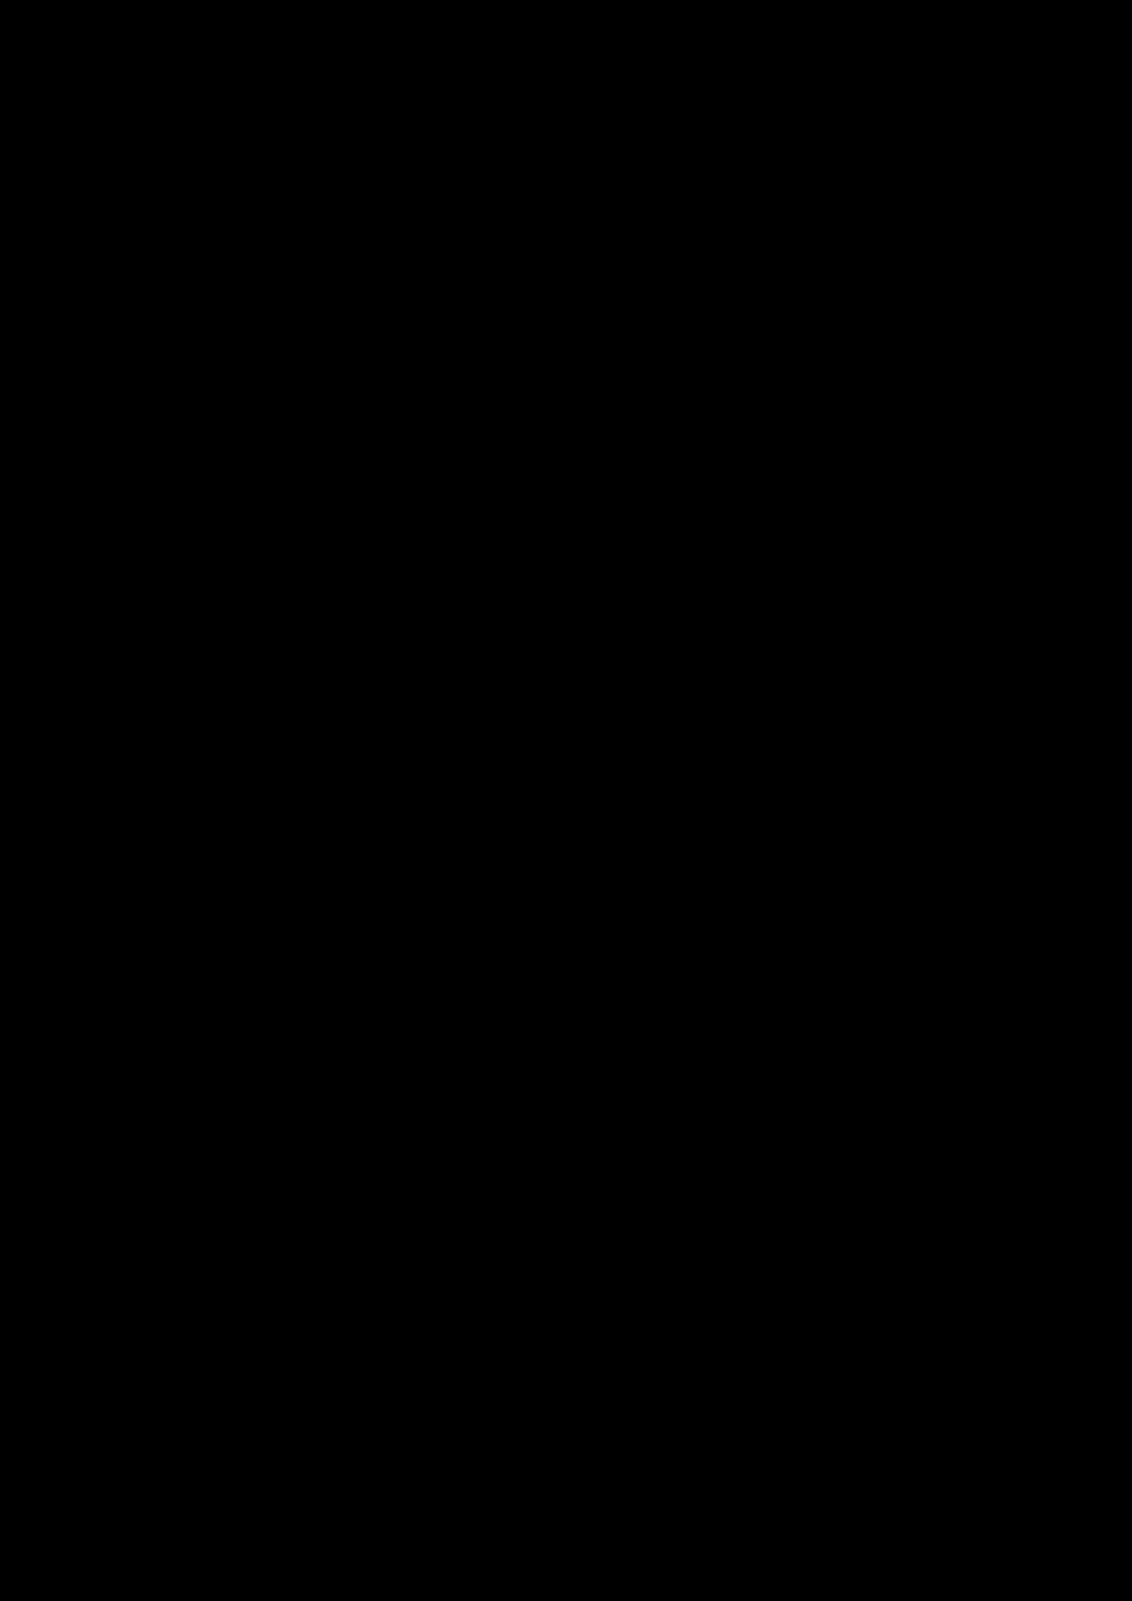 Belyiy sokol slide, Image 175